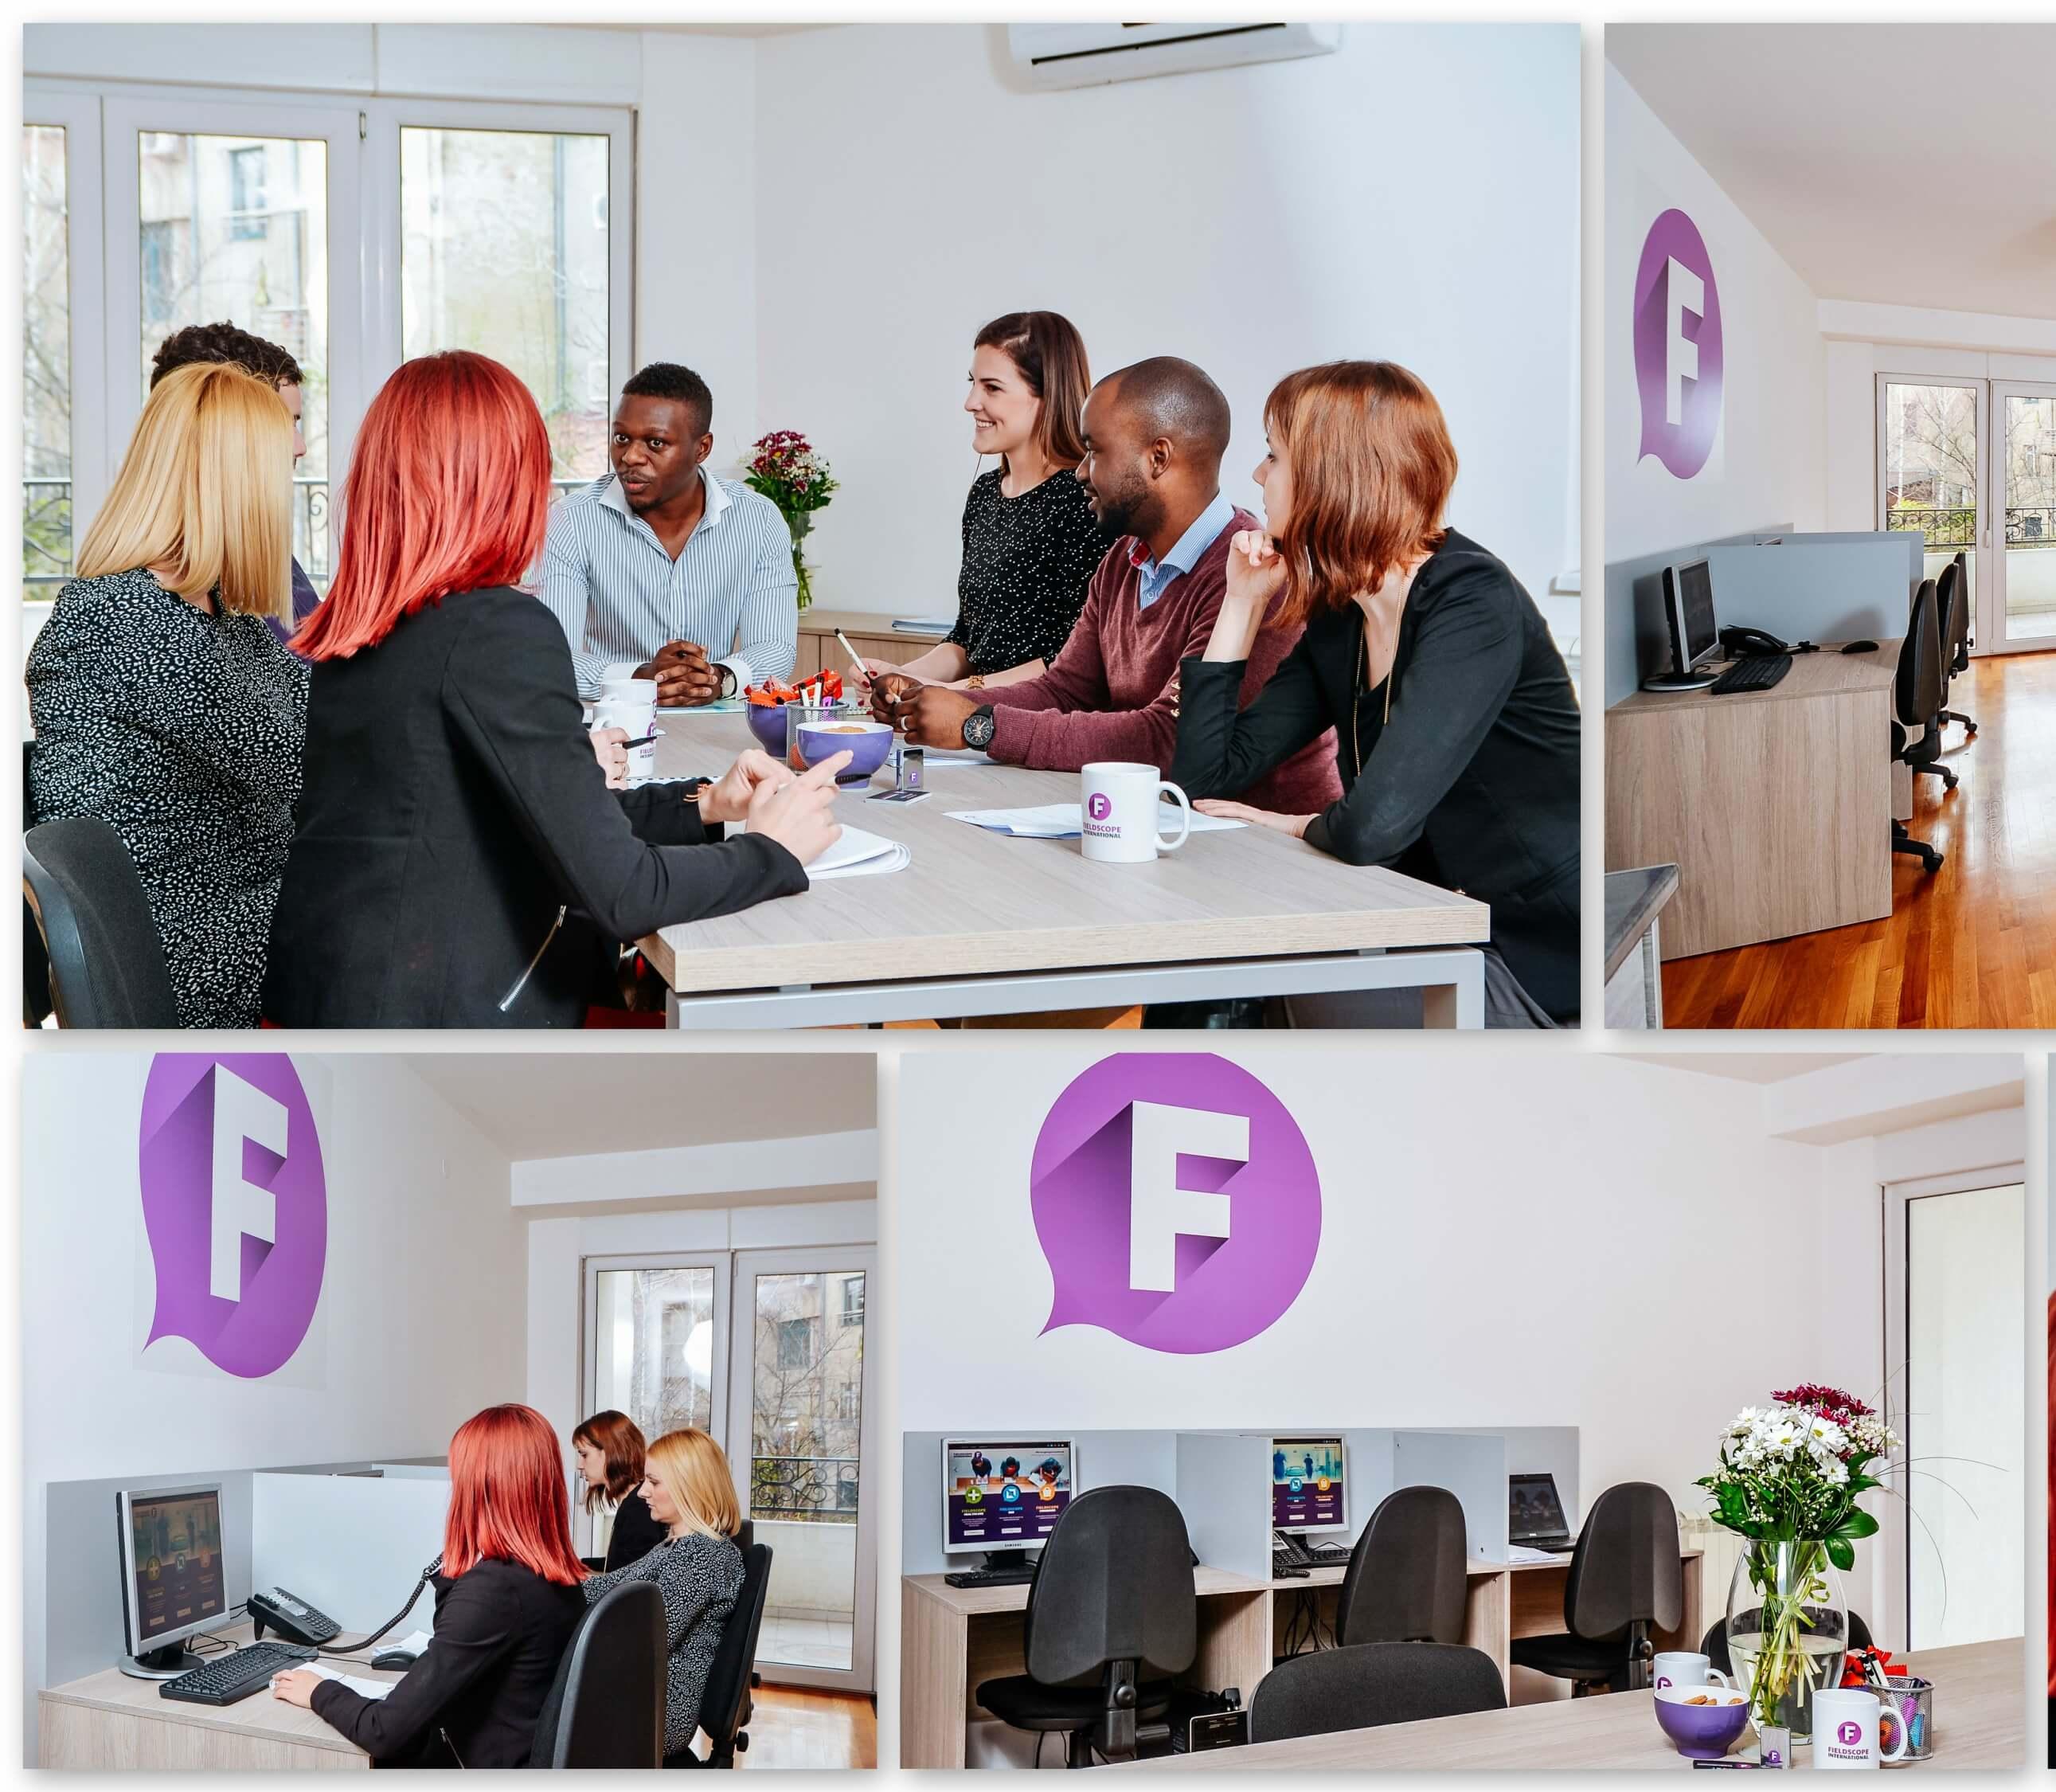 fsi-belgrade-team